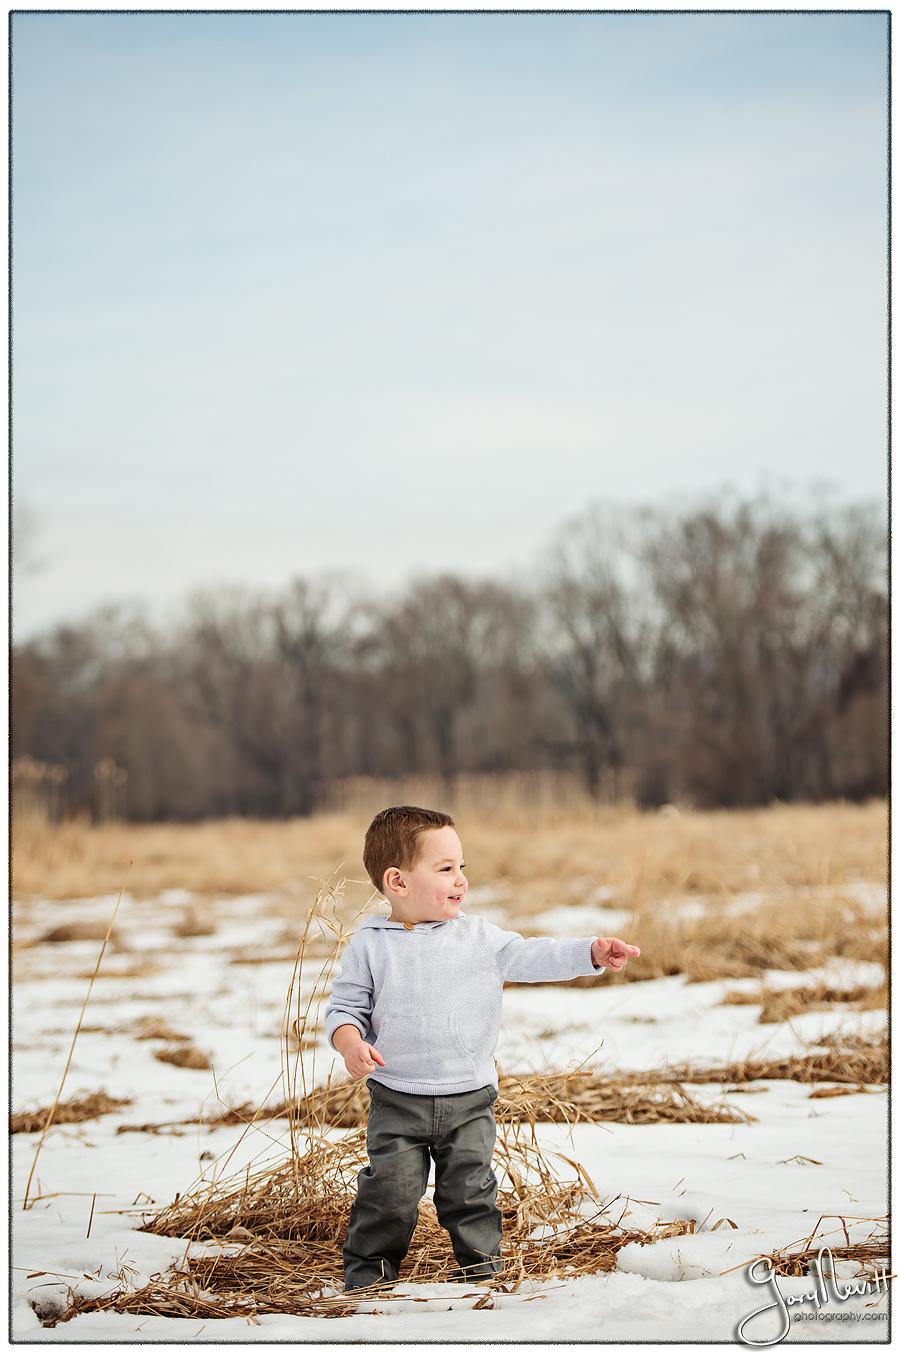 Pregnancy Portraits - Matenity pictures - Reim- Gary Nevitt Photography-171